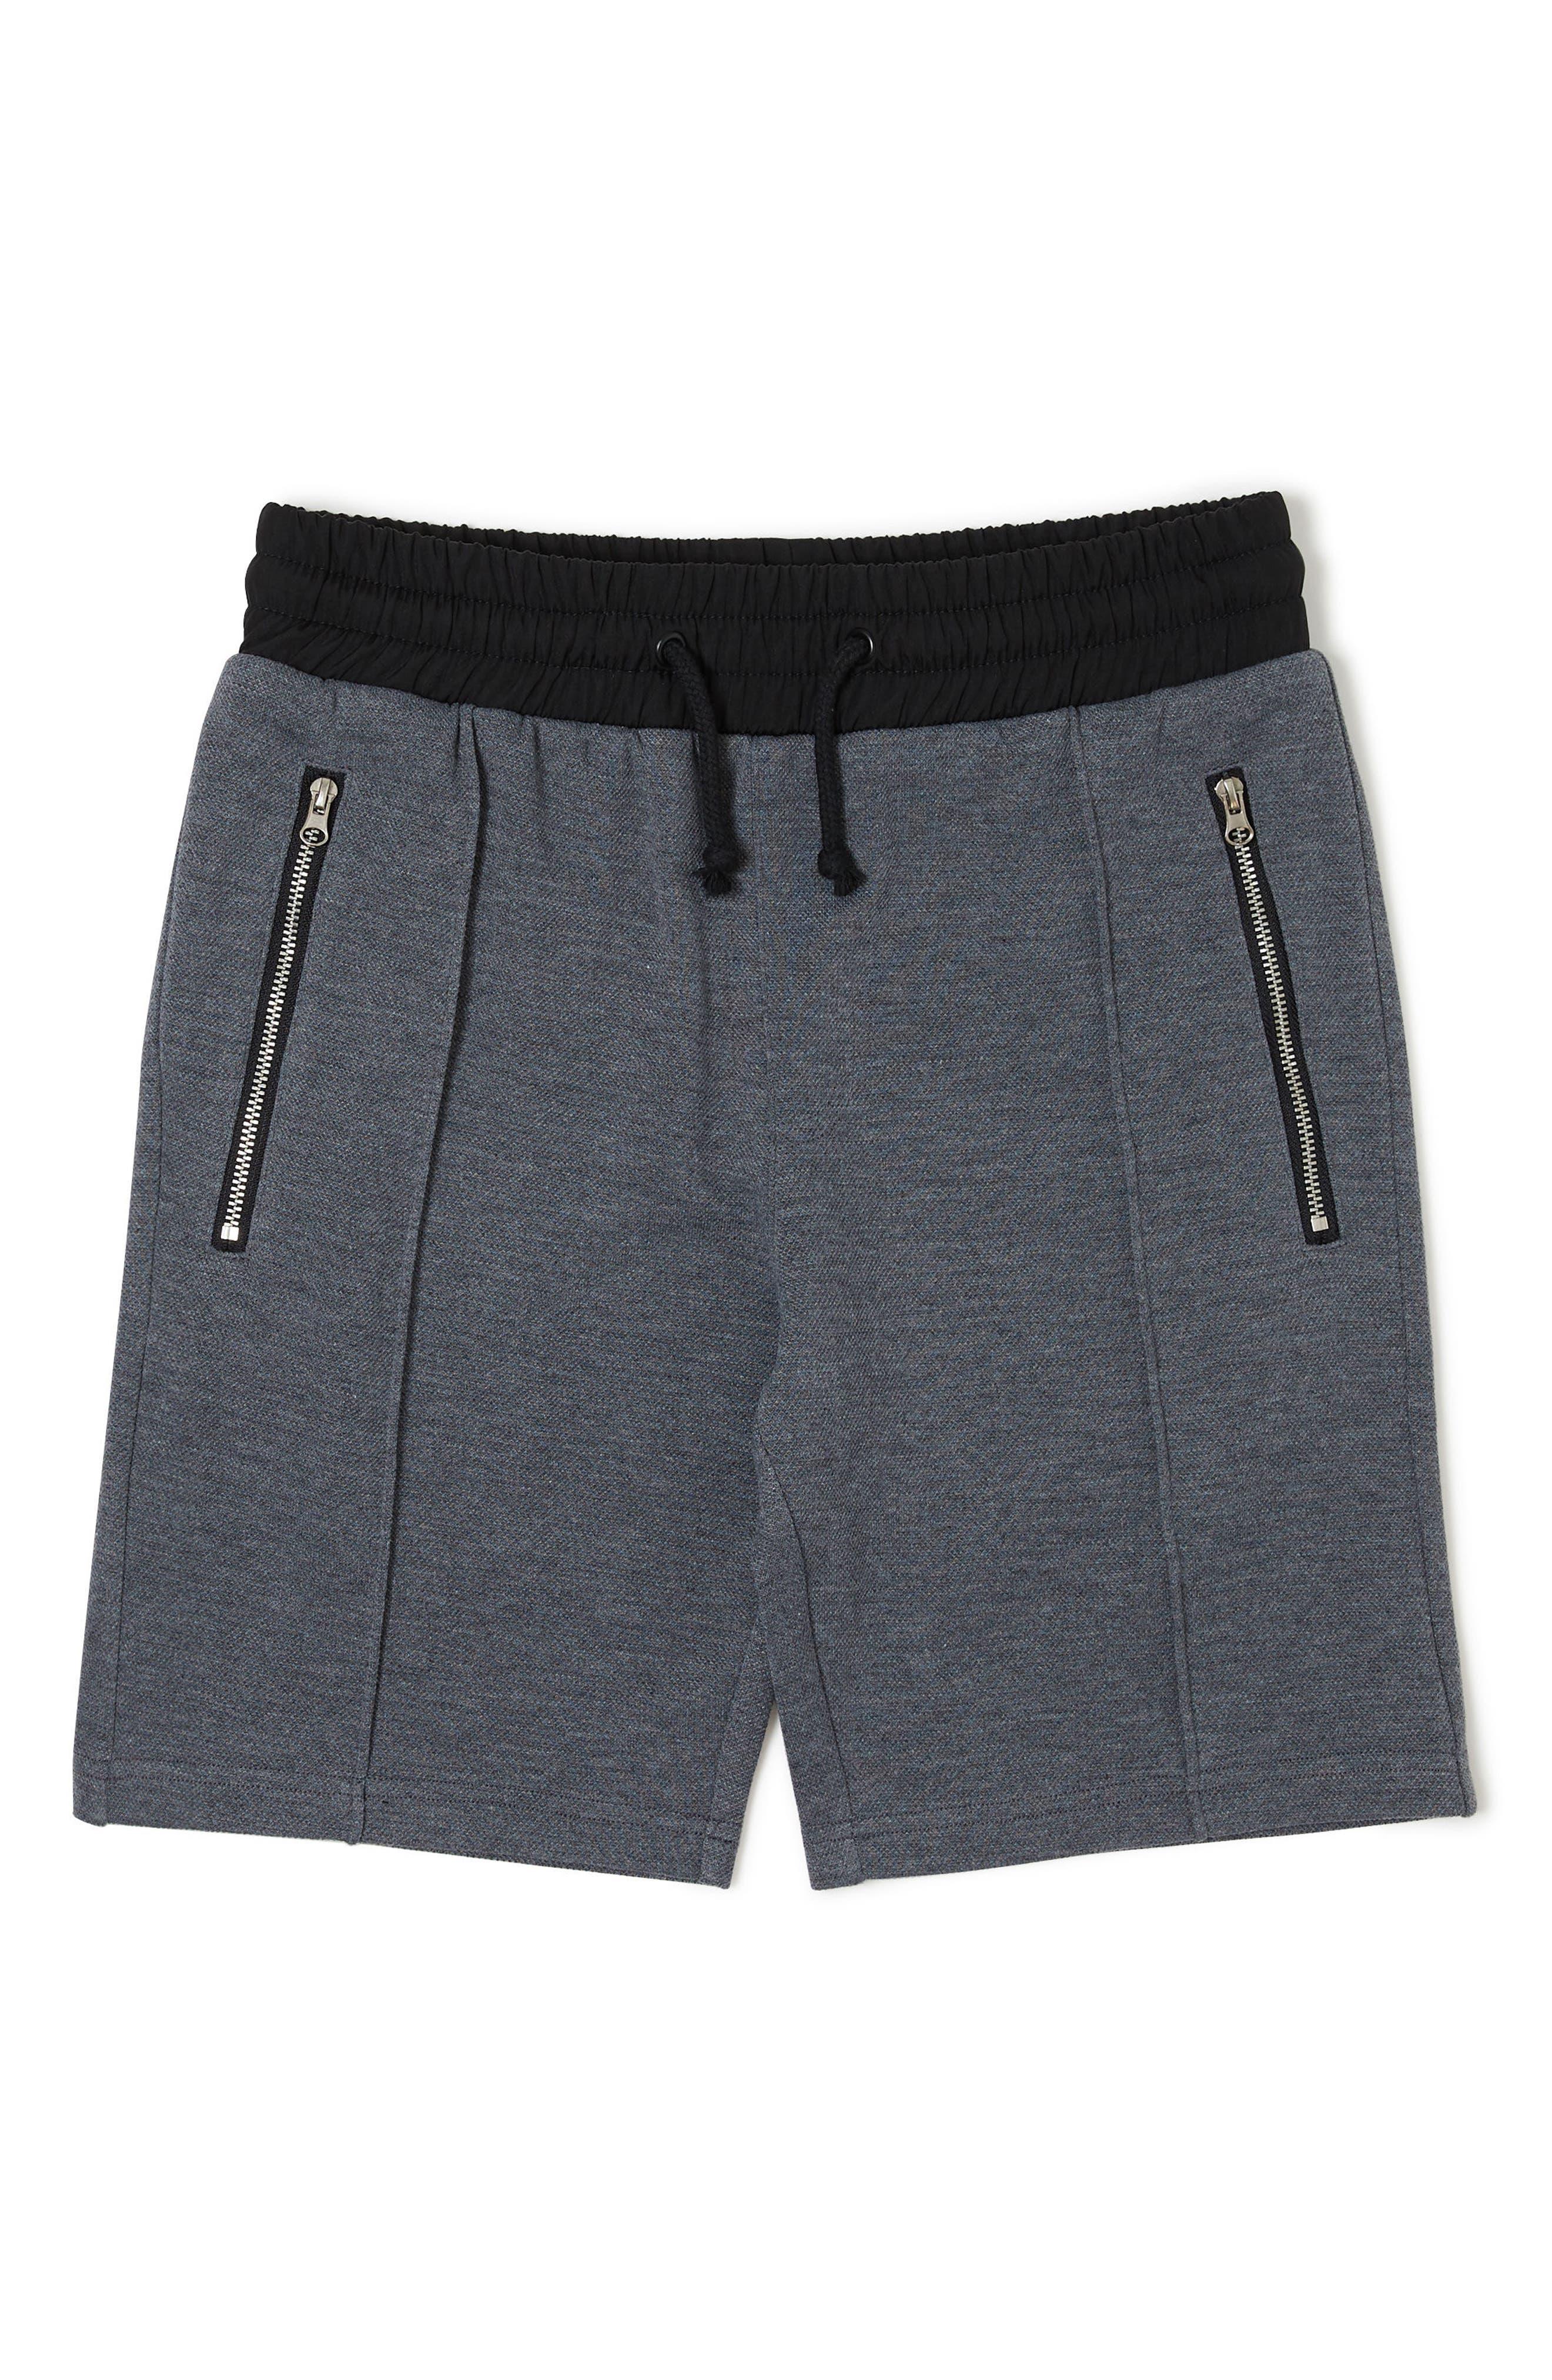 Liam Knit Shorts,                             Main thumbnail 1, color,                             HEATHER GREY